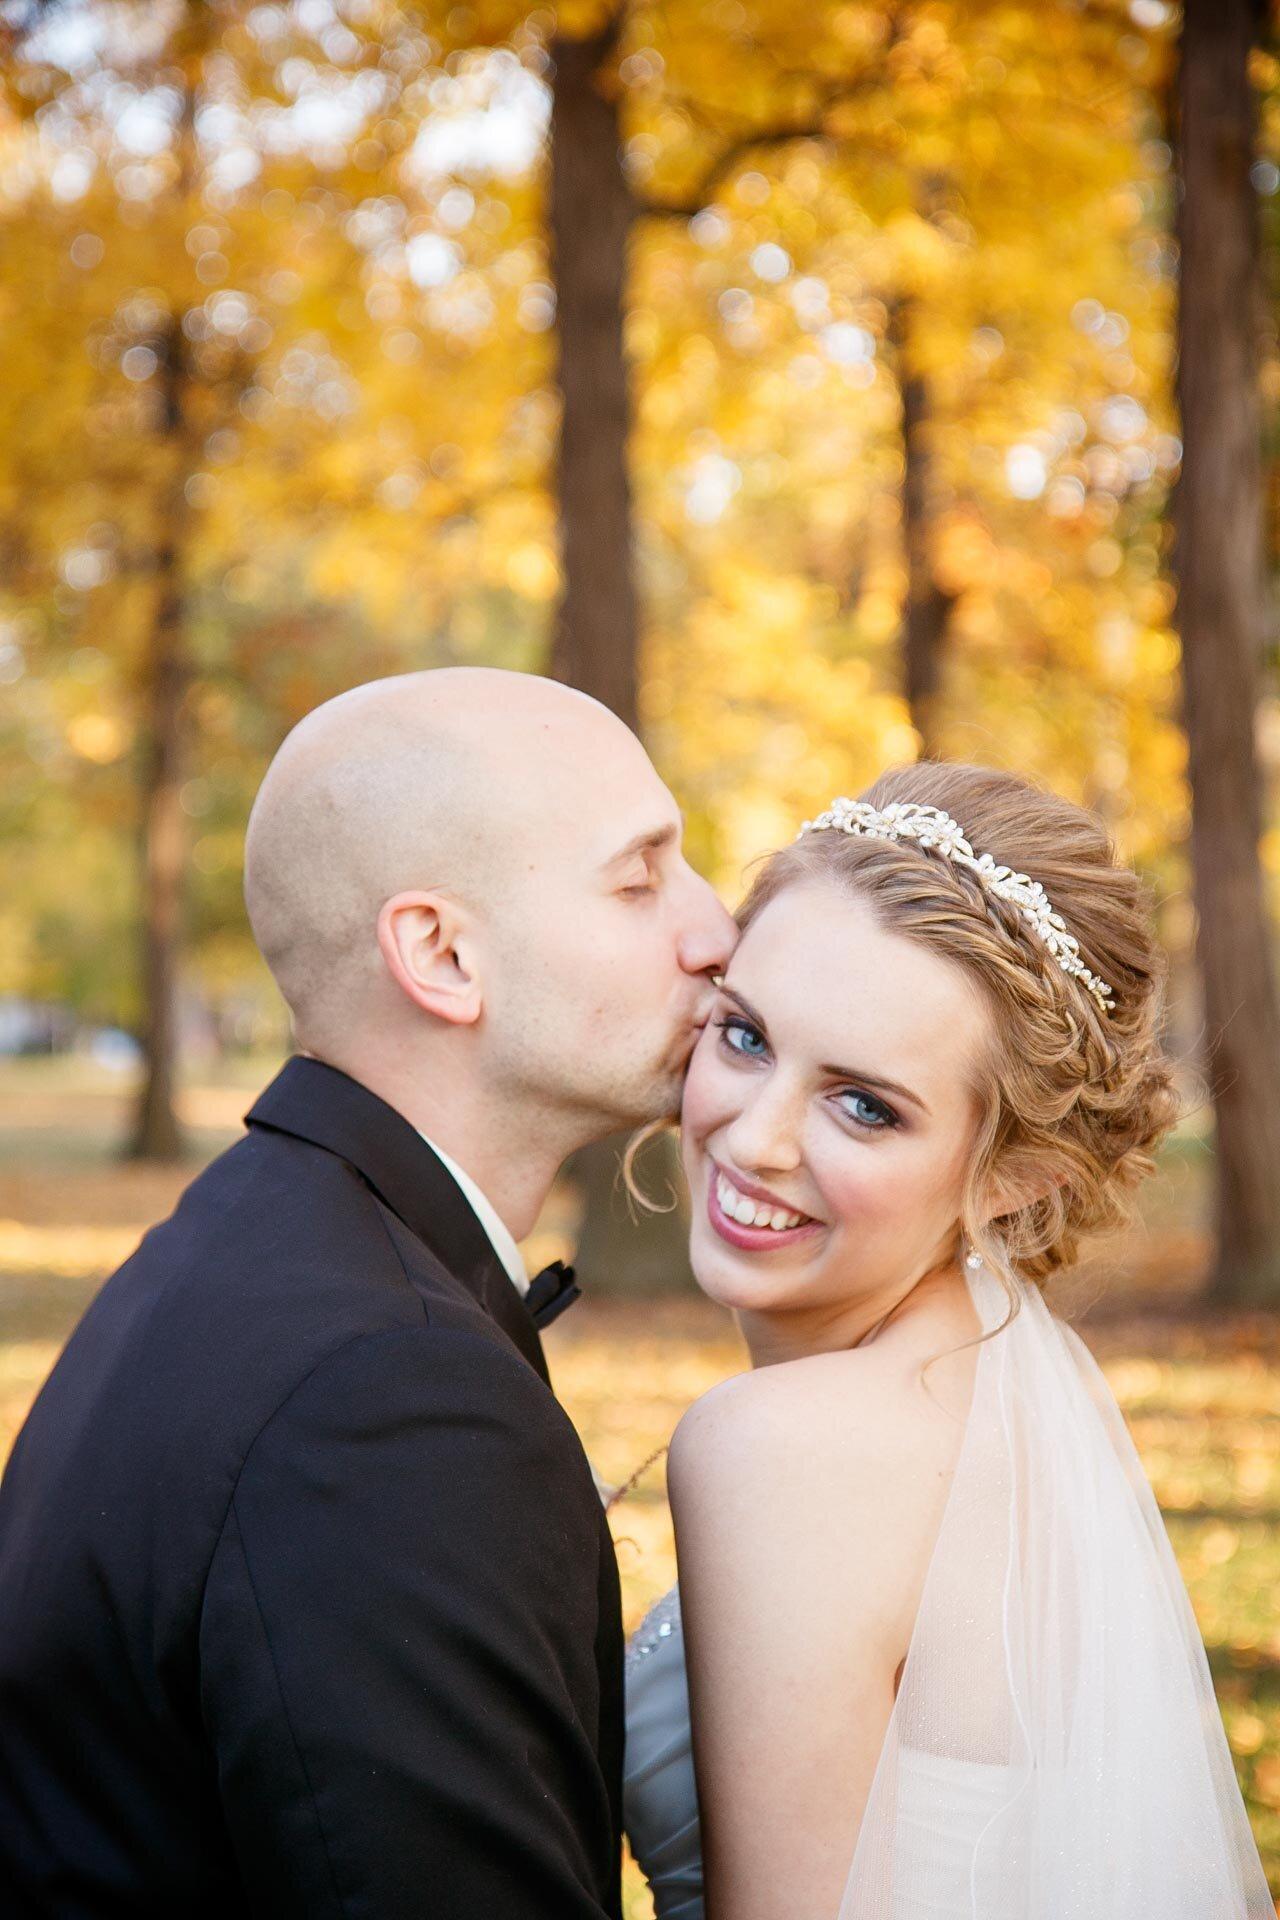 fall-lighting-adam-shea-photography-wedding-engagement-blog-adam-shea-photography-green-bay-appleton-neenah-photographer-12.jpg